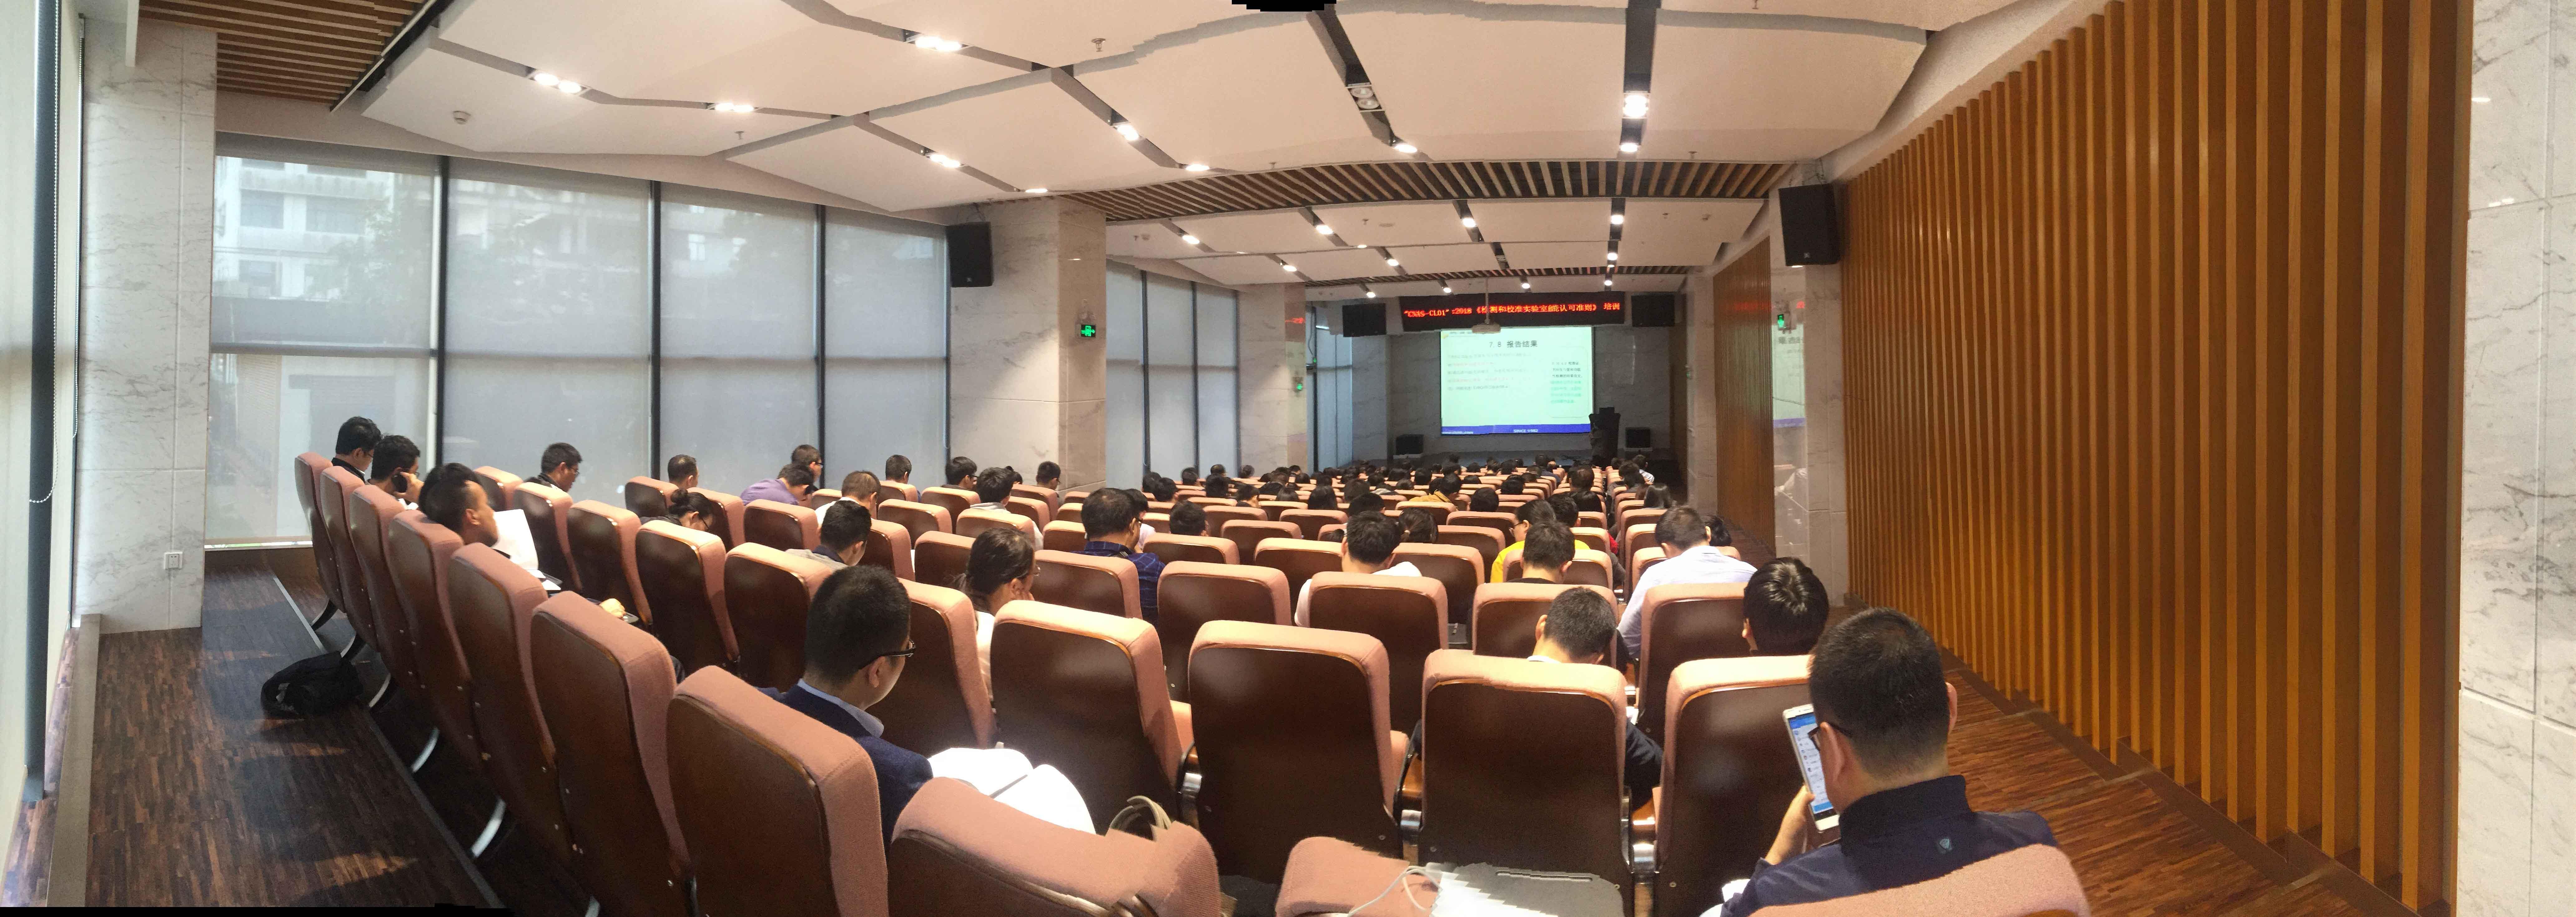 """CNAS-CL01:2018《检测和校准实验室能力认可准则》""培训班成功举办"